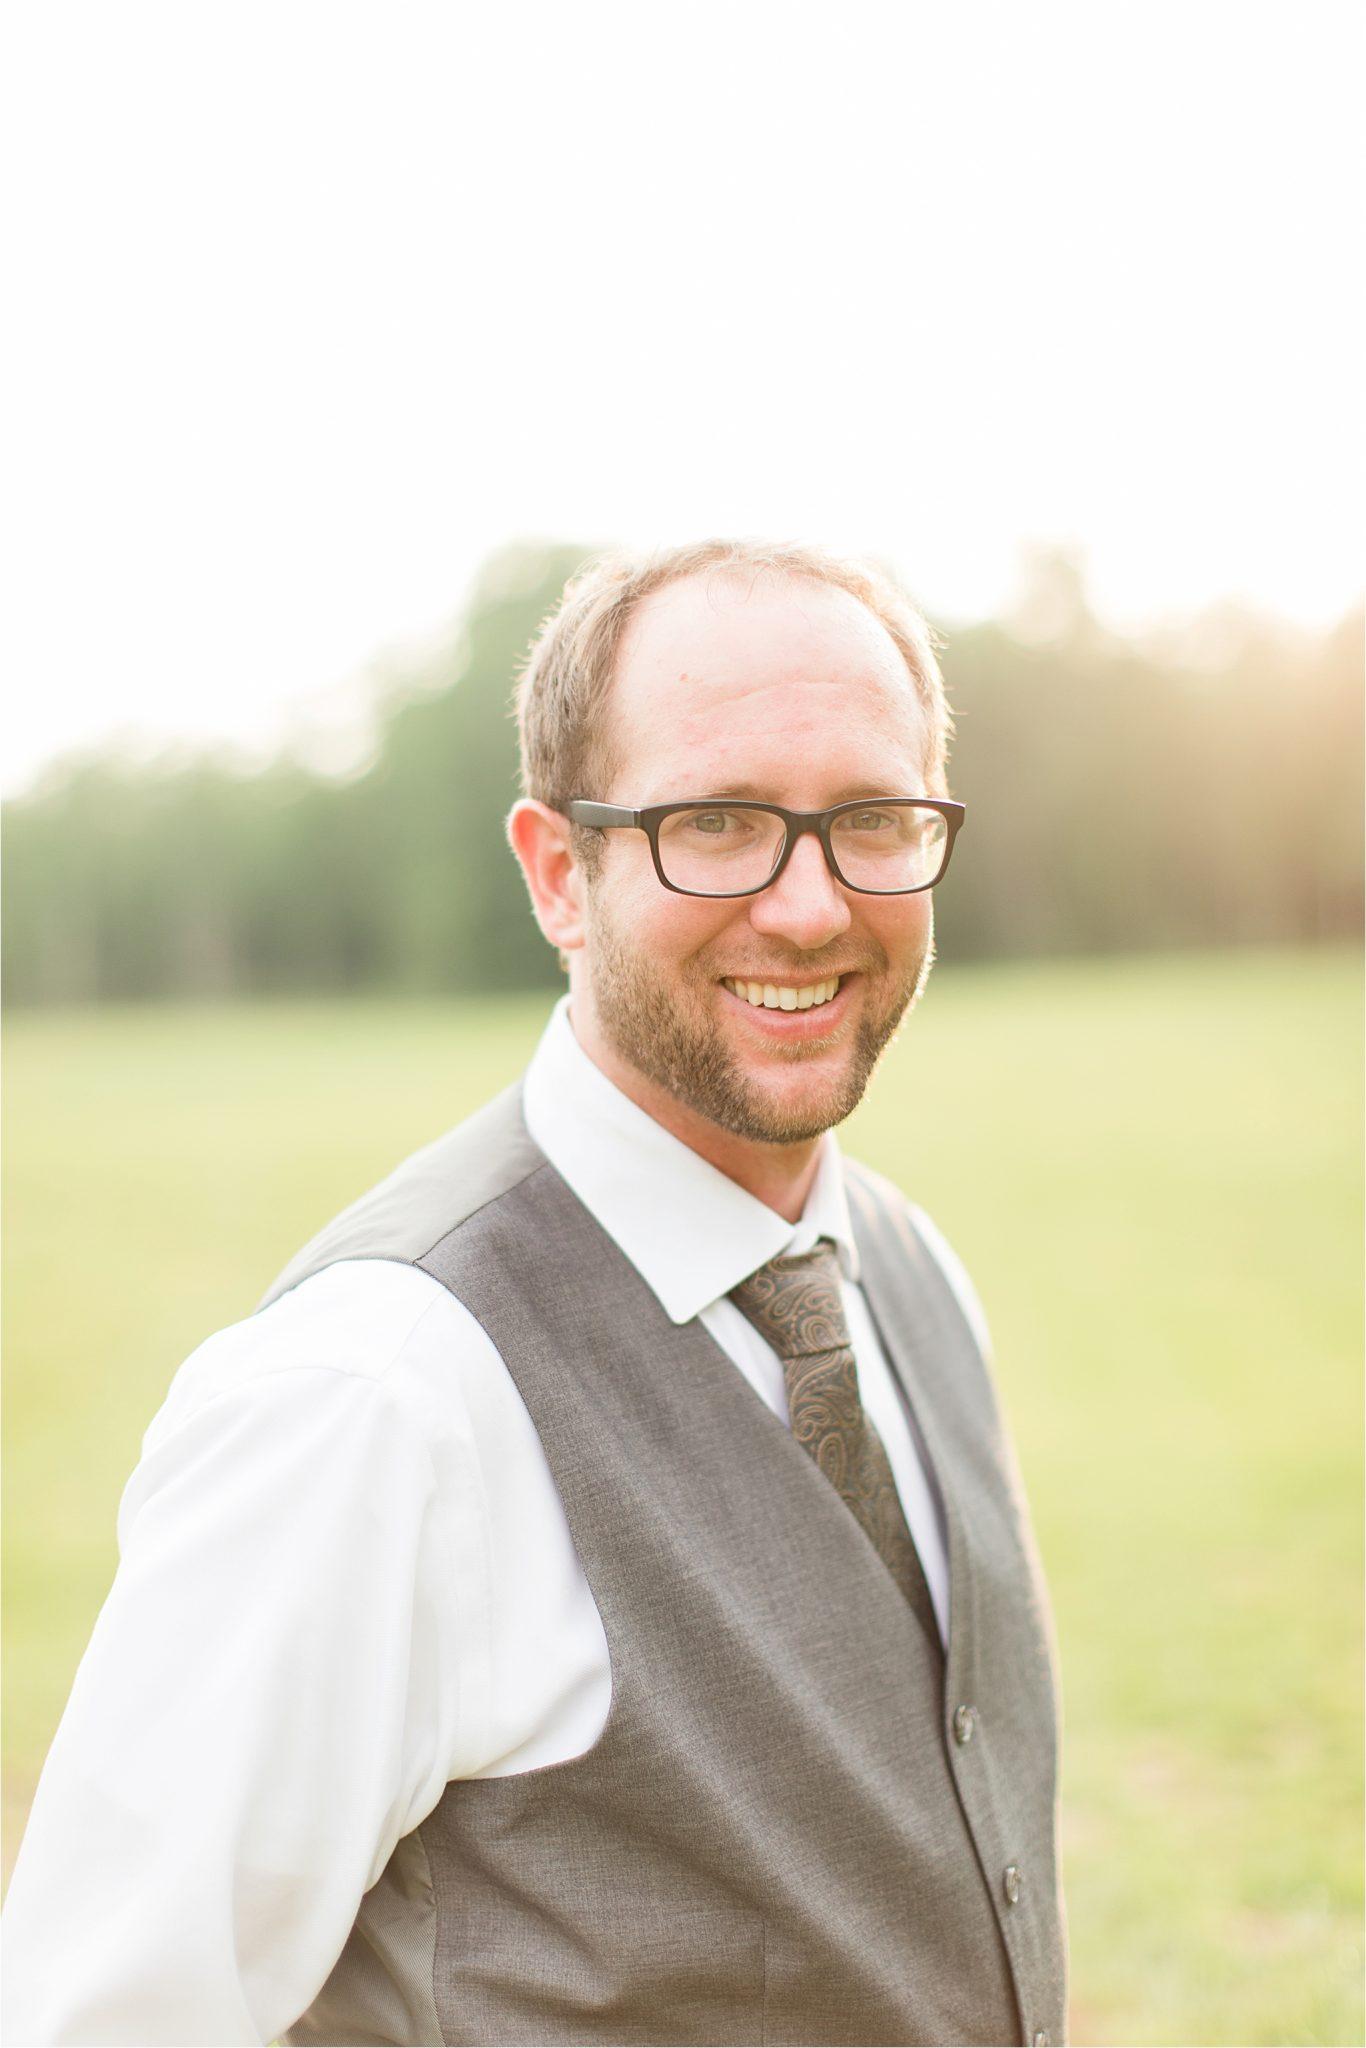 paisley tie-backyard country wedding-groom portraits-grey vest-white dress shirt